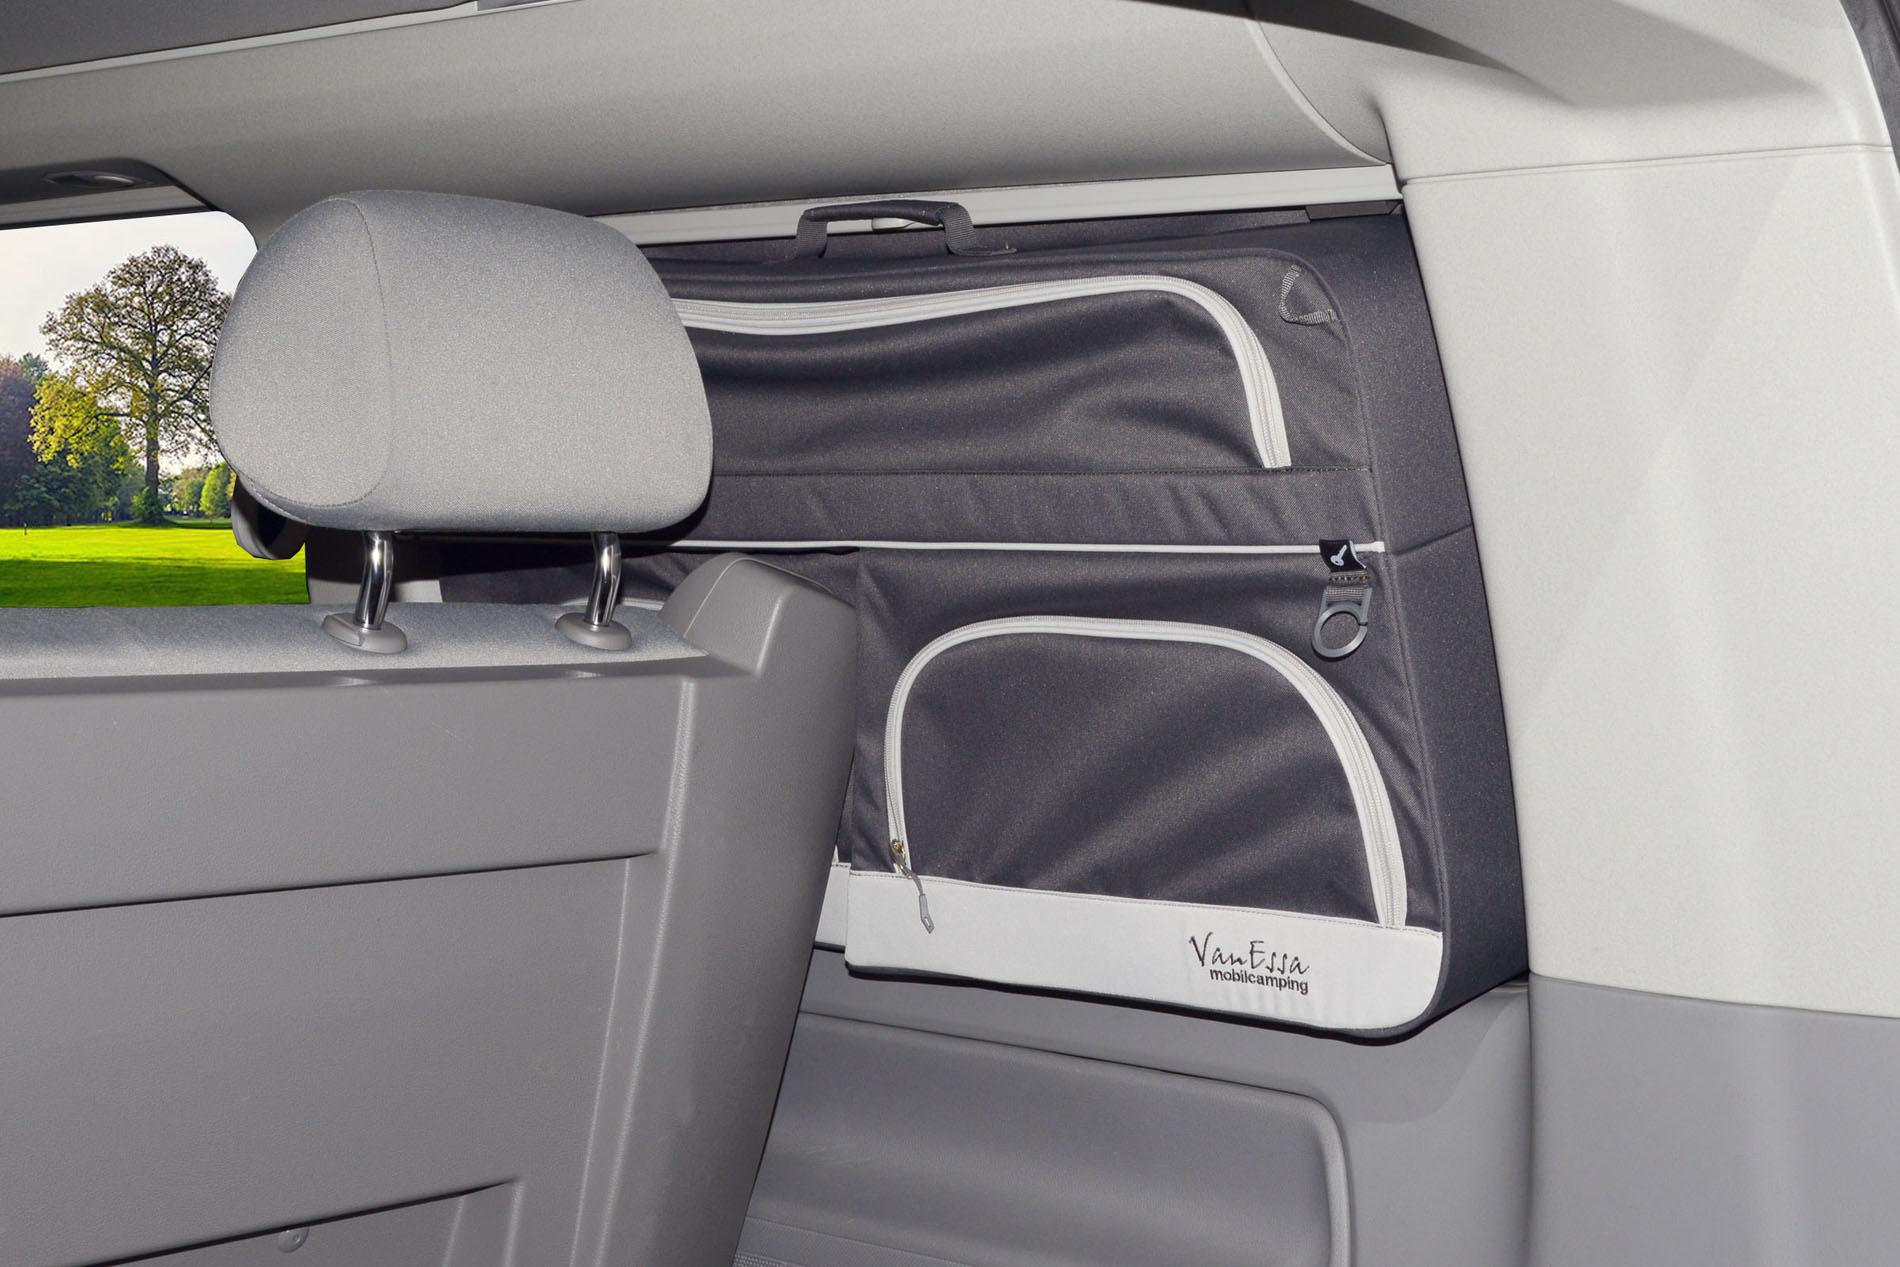 T5 fenster packtaschen Packtaschen VW